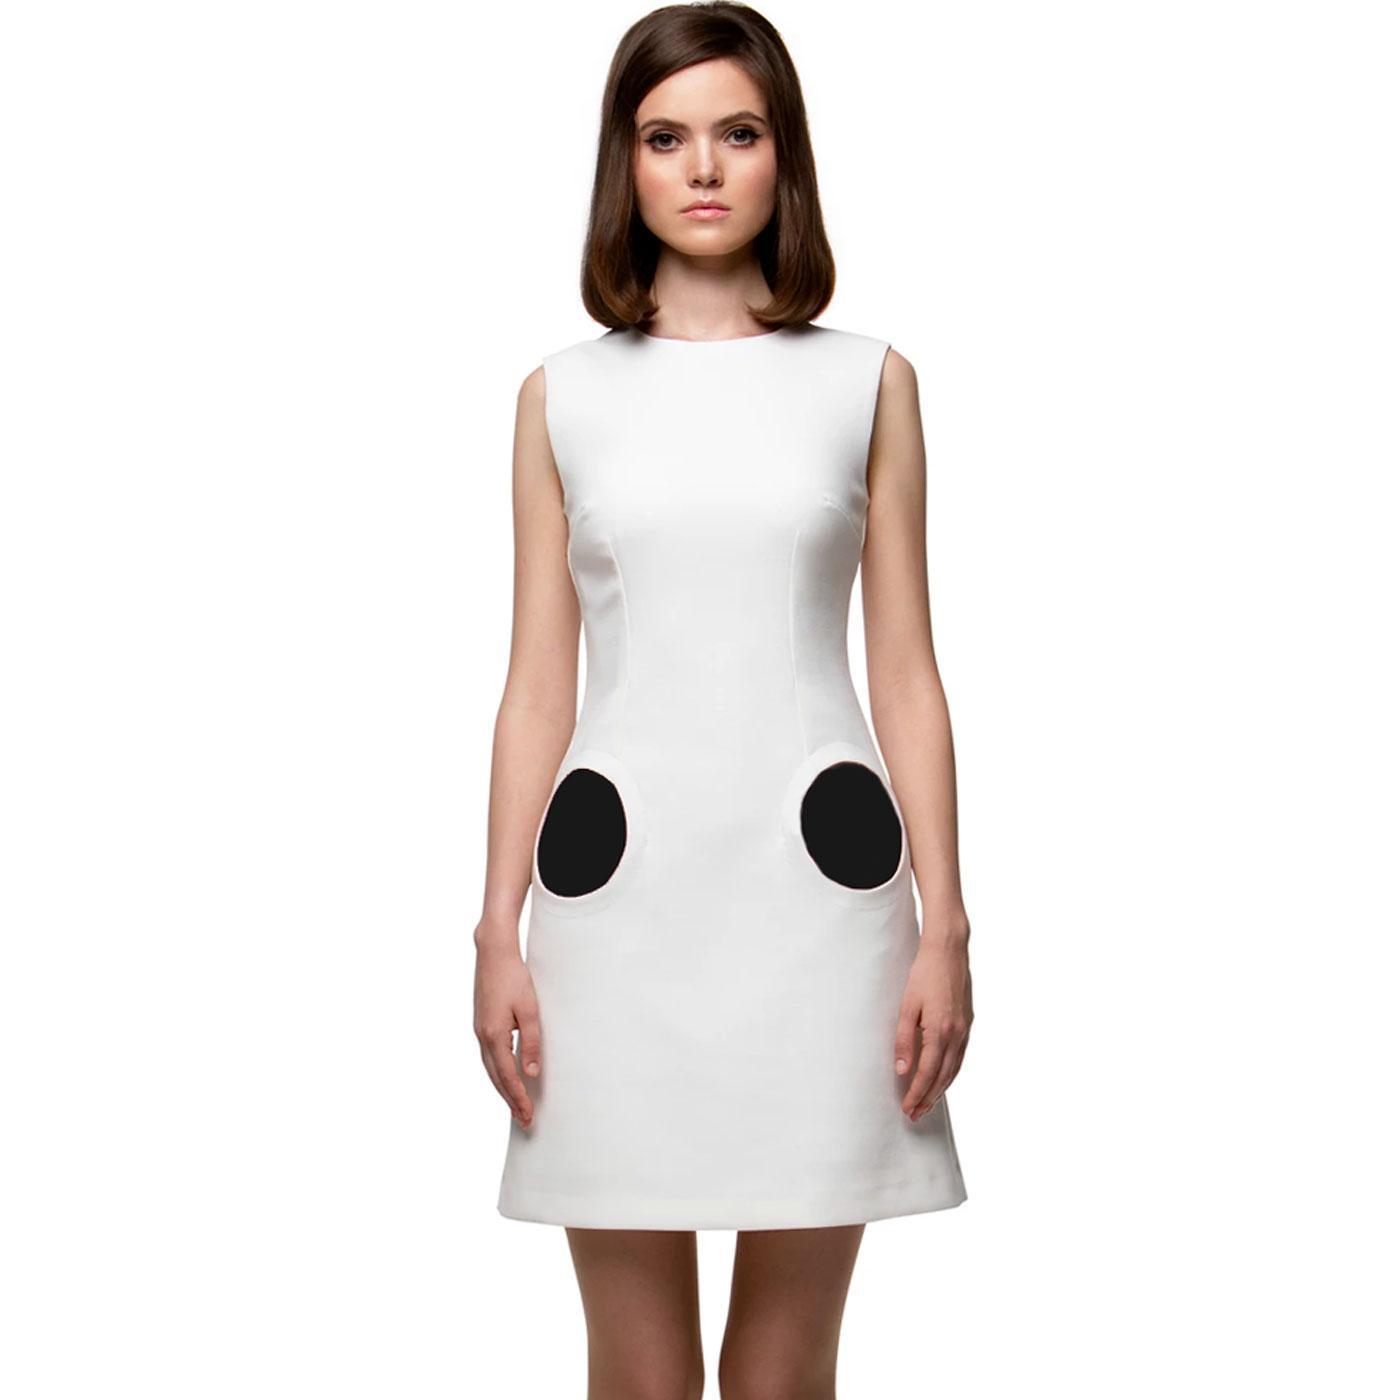 MARMALADE 1960s Mod Circle Pocket Dress (Cream)